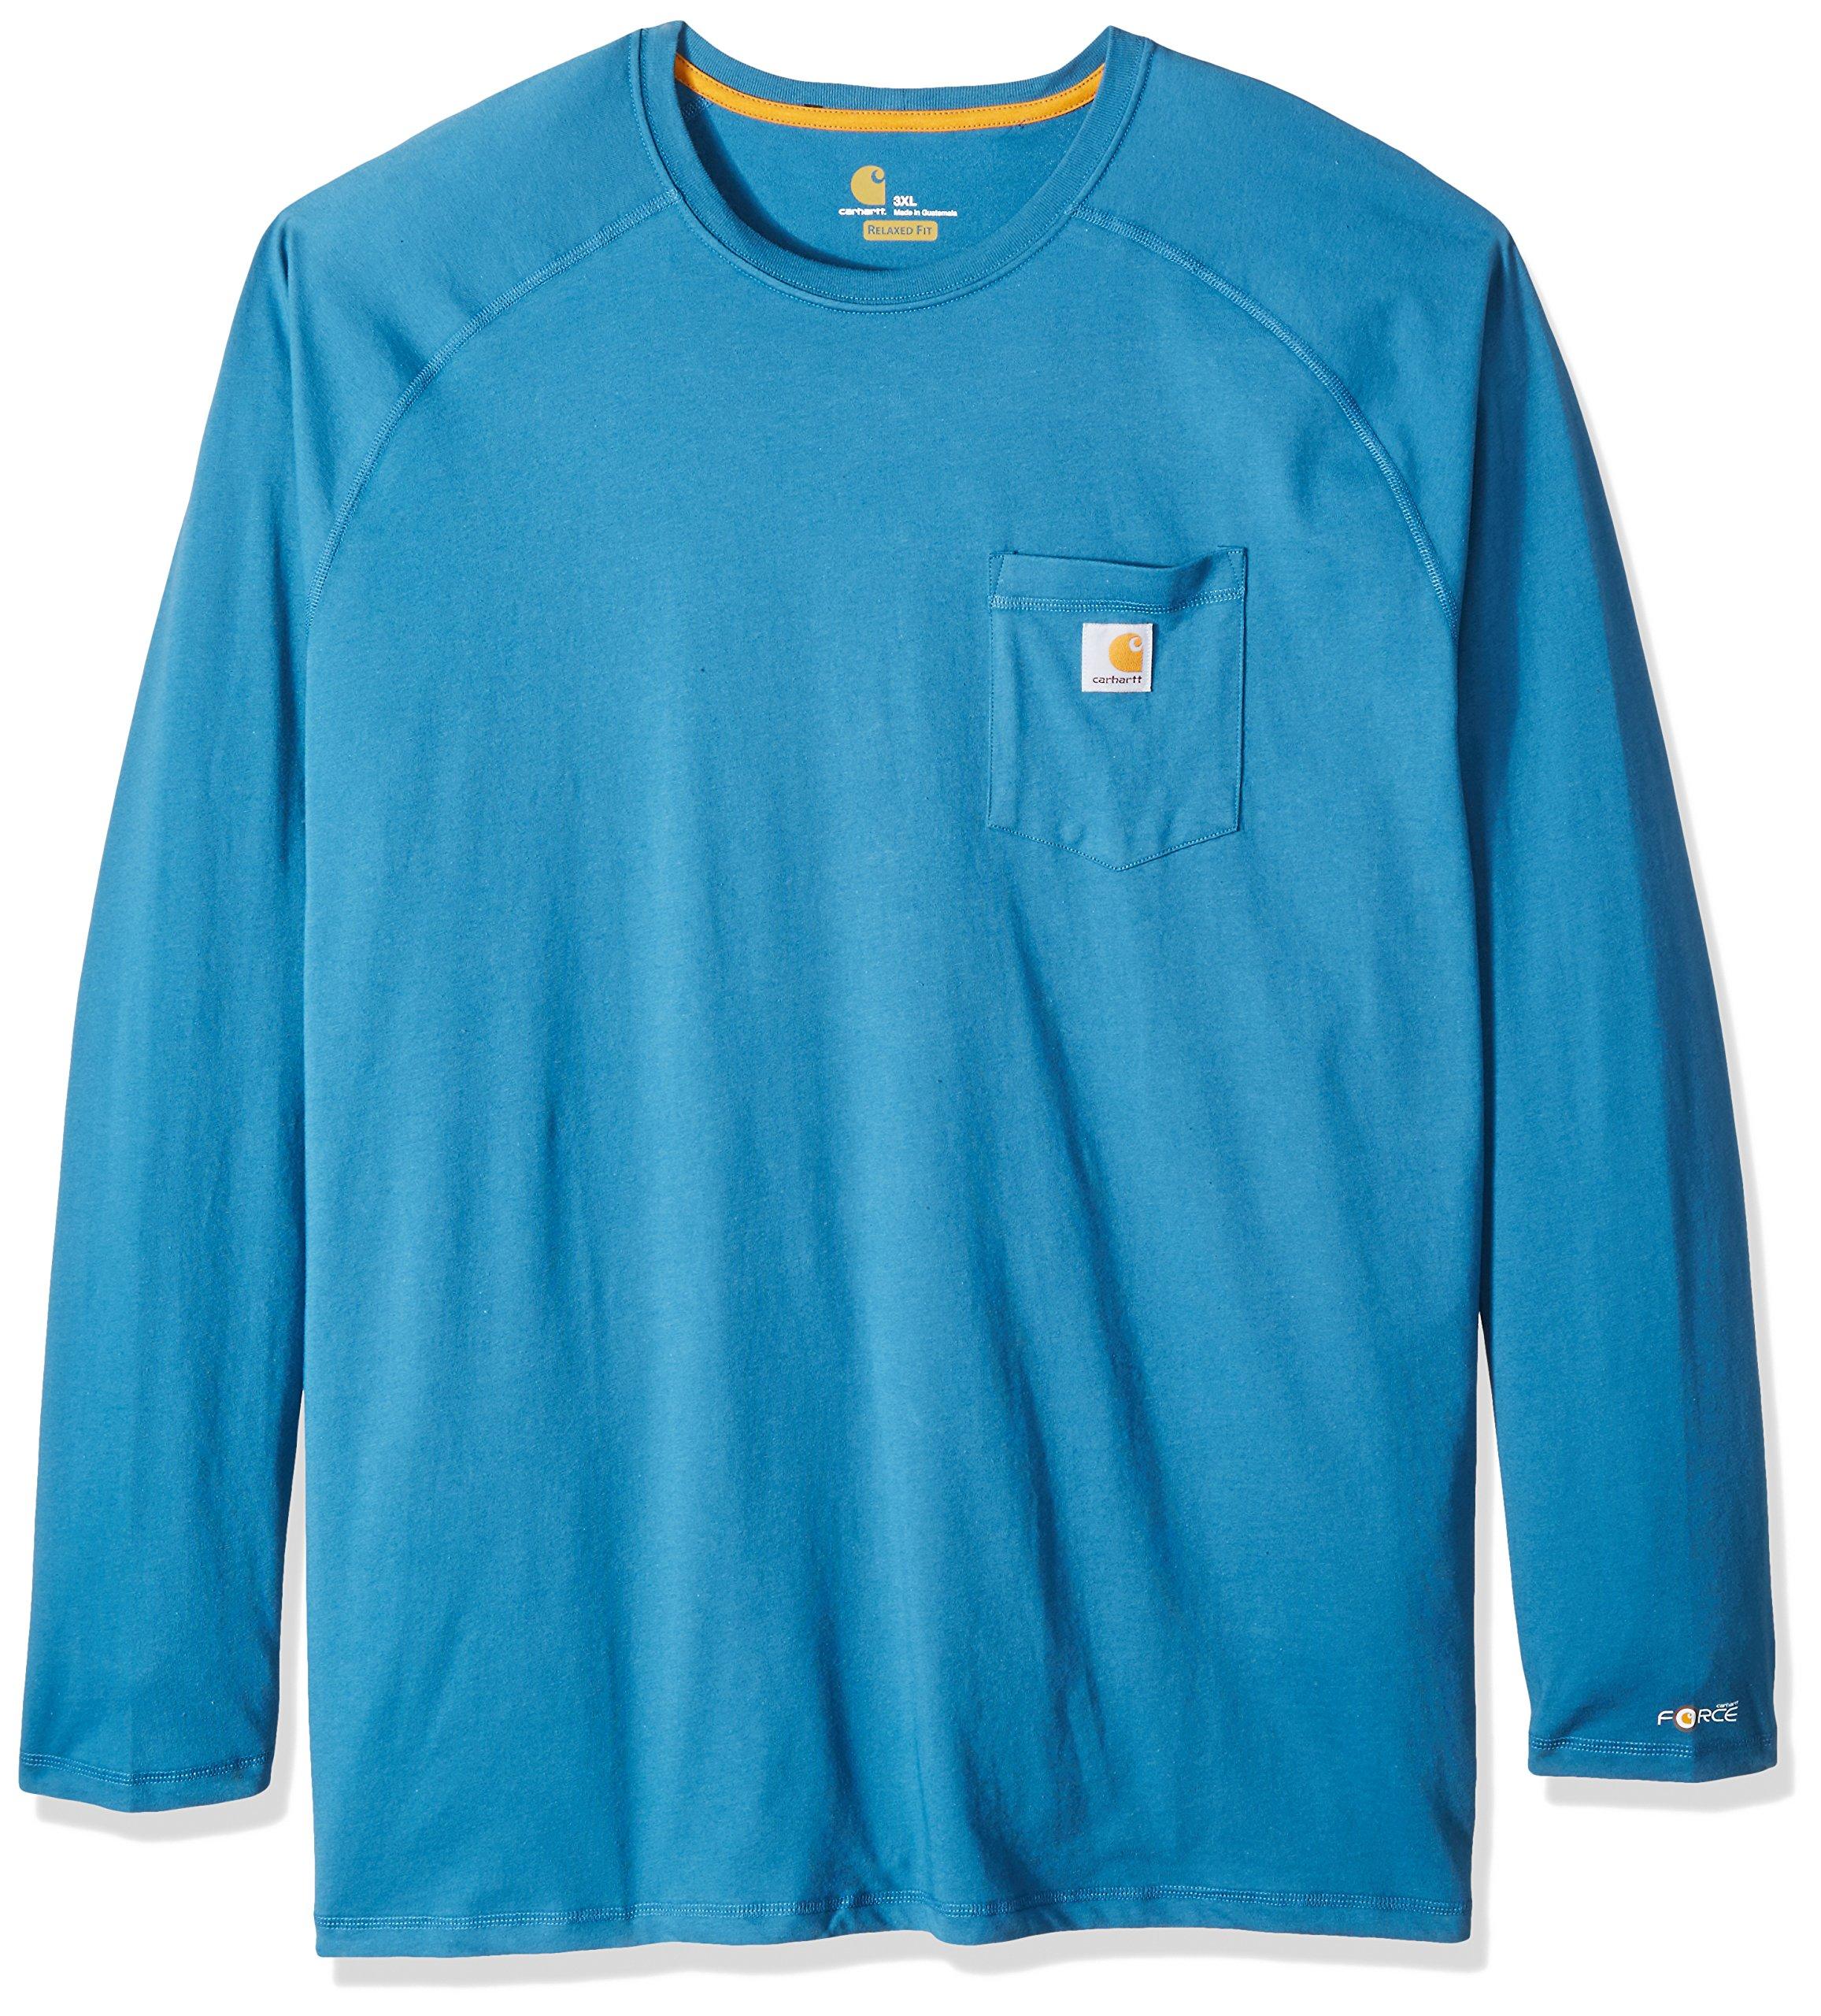 Carhartt Men's Big & Tall Force Cotton Delmont Long Sleeve T Shirt, Bay Harbor, Large/Tall